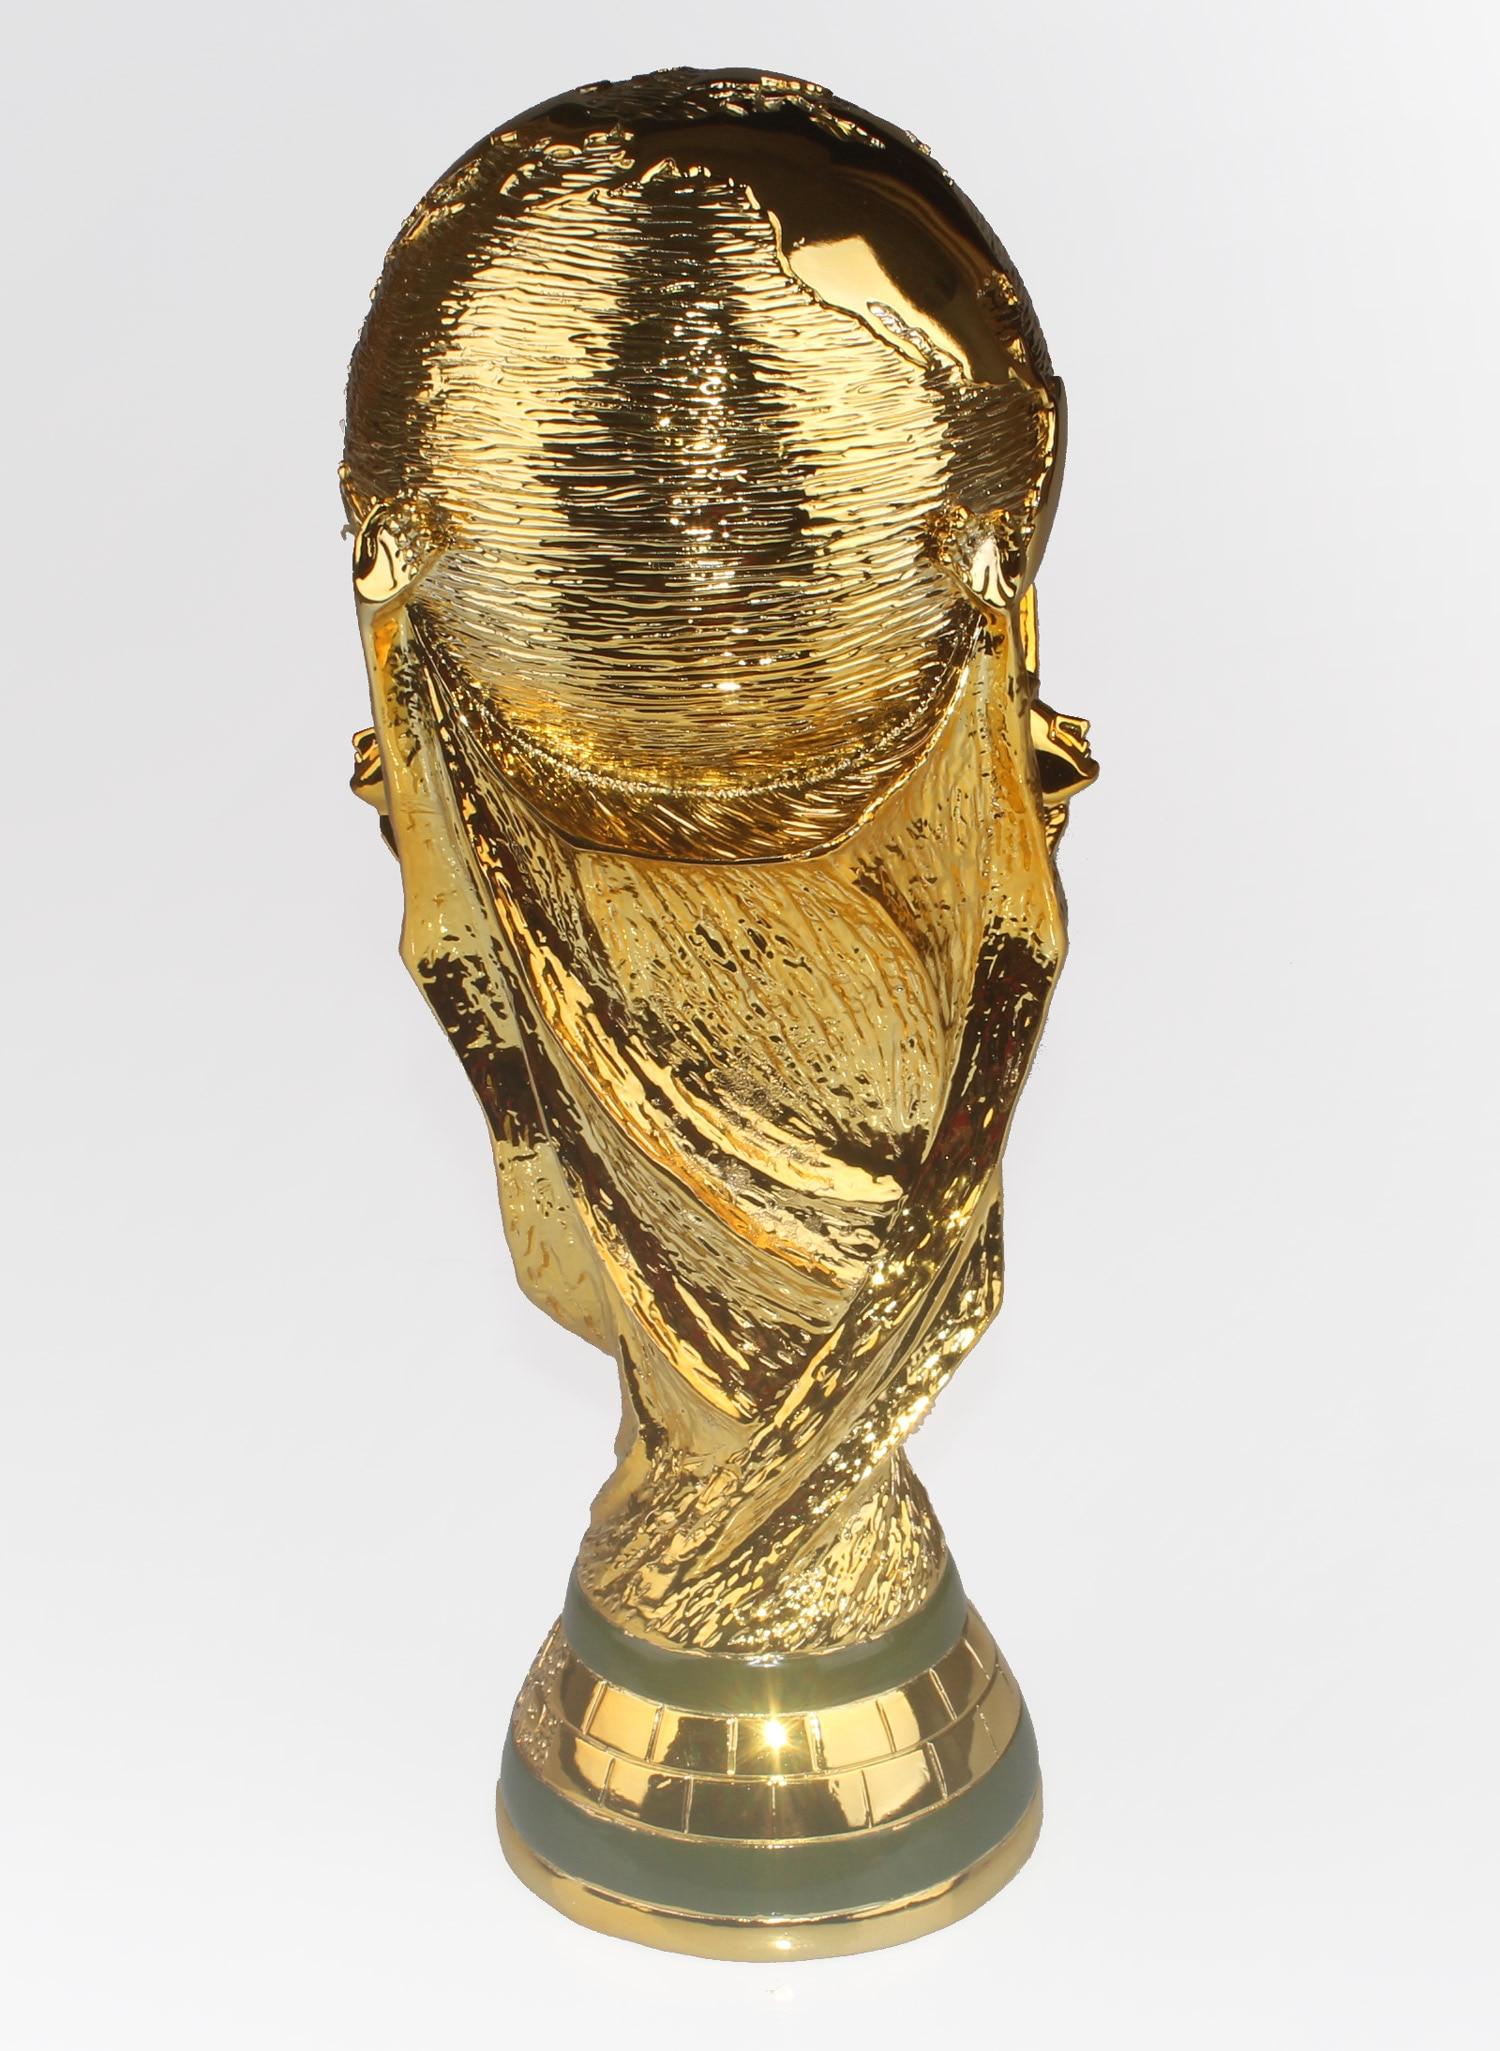 2018 <font><b>World</b></font> <font><b>Cup</b></font> Trophy Model Full Size 36cm Solid 5KG Statue gold resin materials trophies